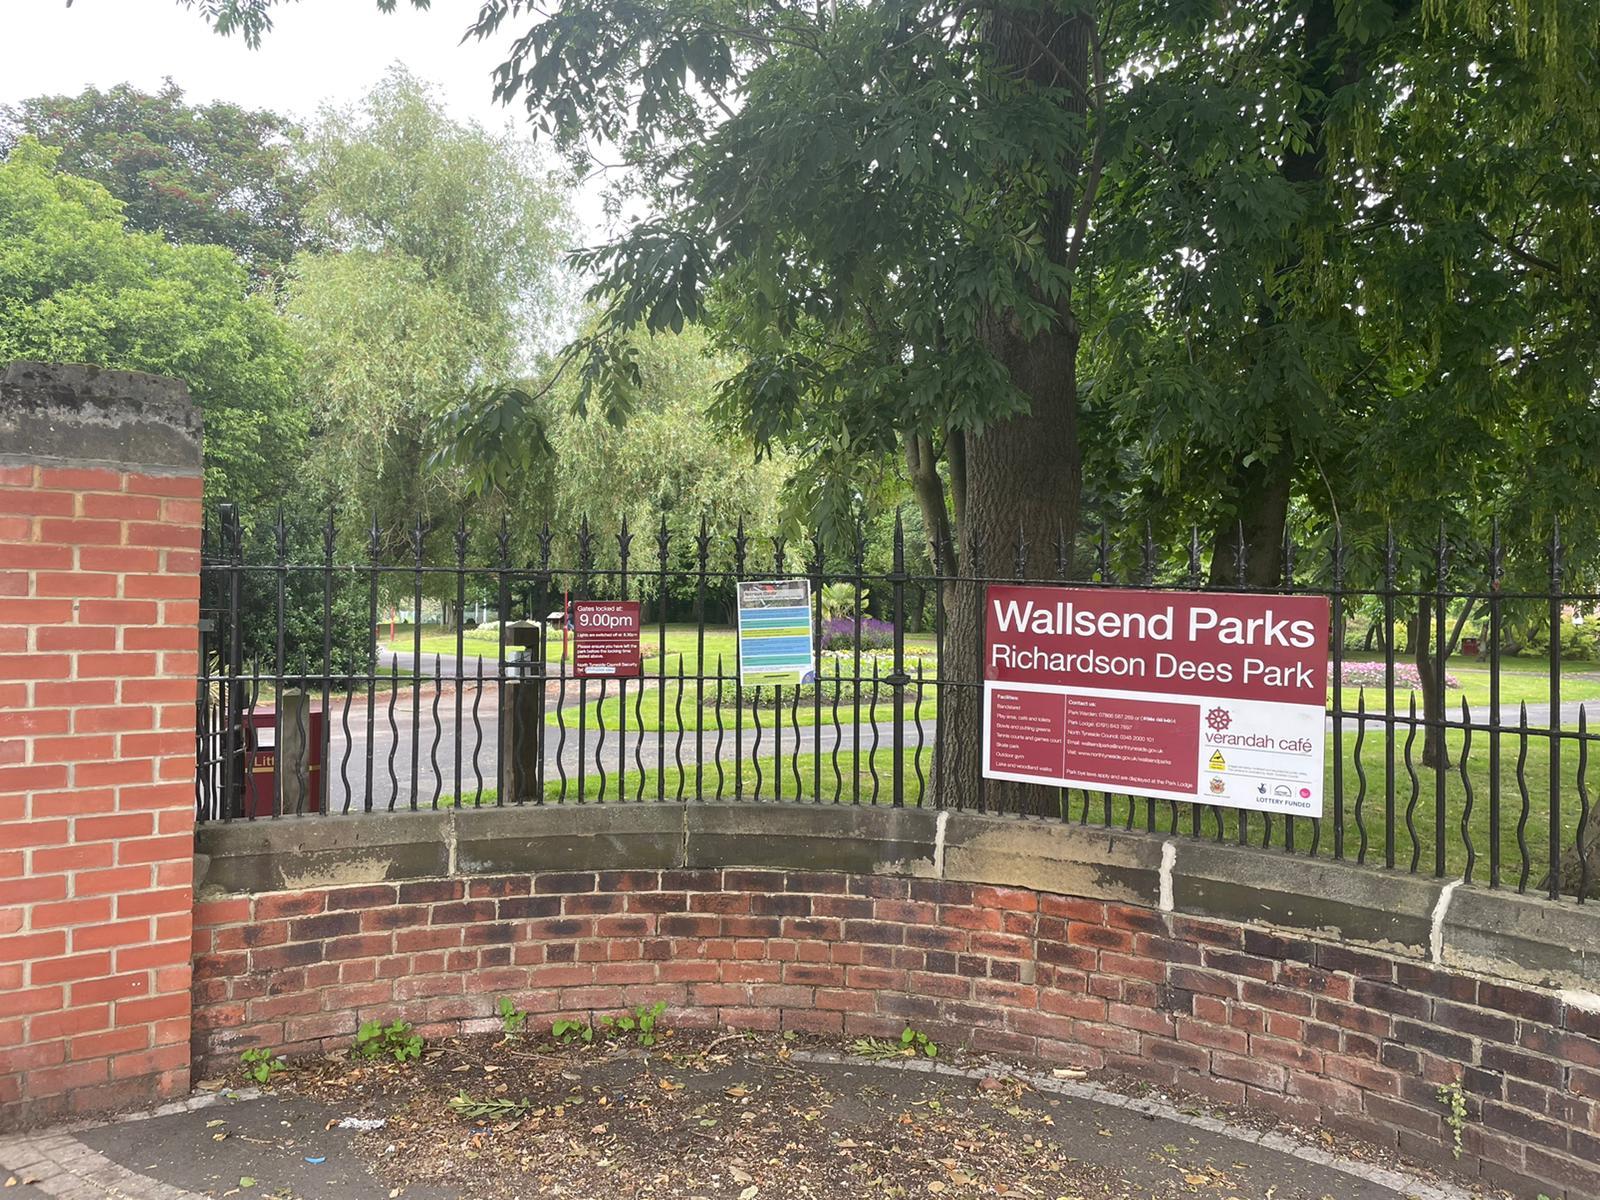 Wallsend Parks Richardson Dees Park 101 North Rd, Wallsend NE28 8RH